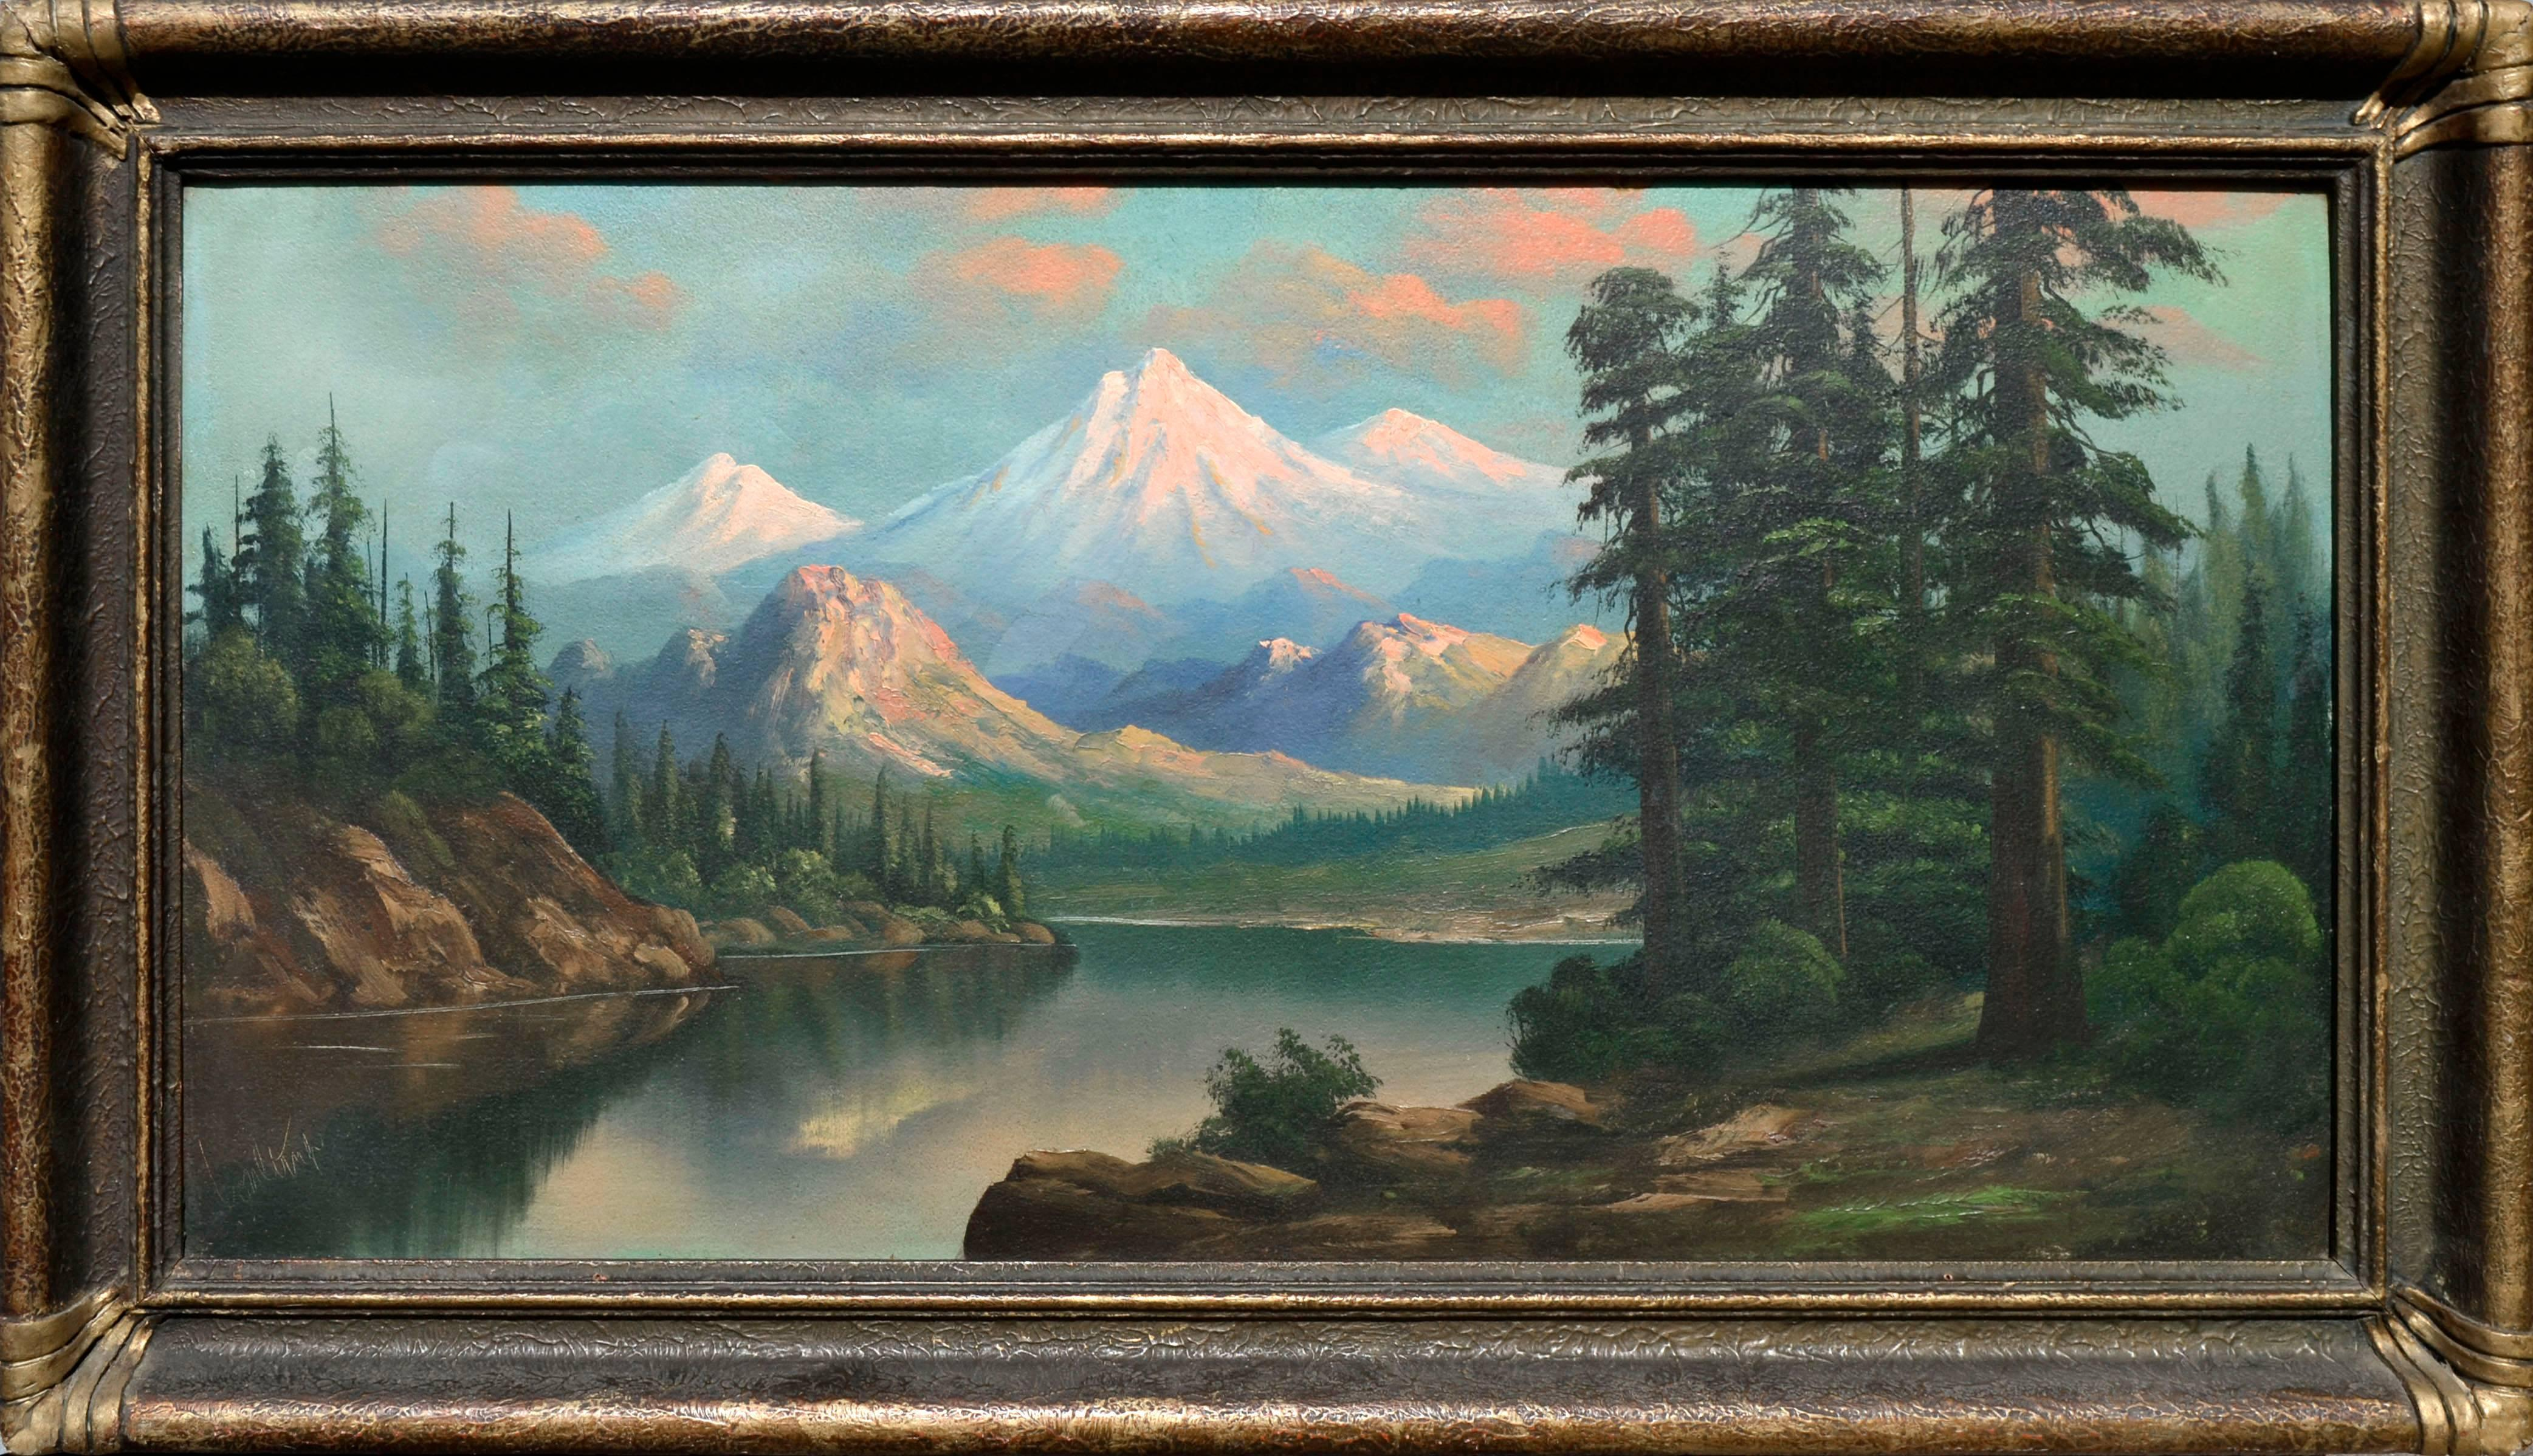 Snow Capped Mountains and Lake - Mt. Hood Oregon Landscape